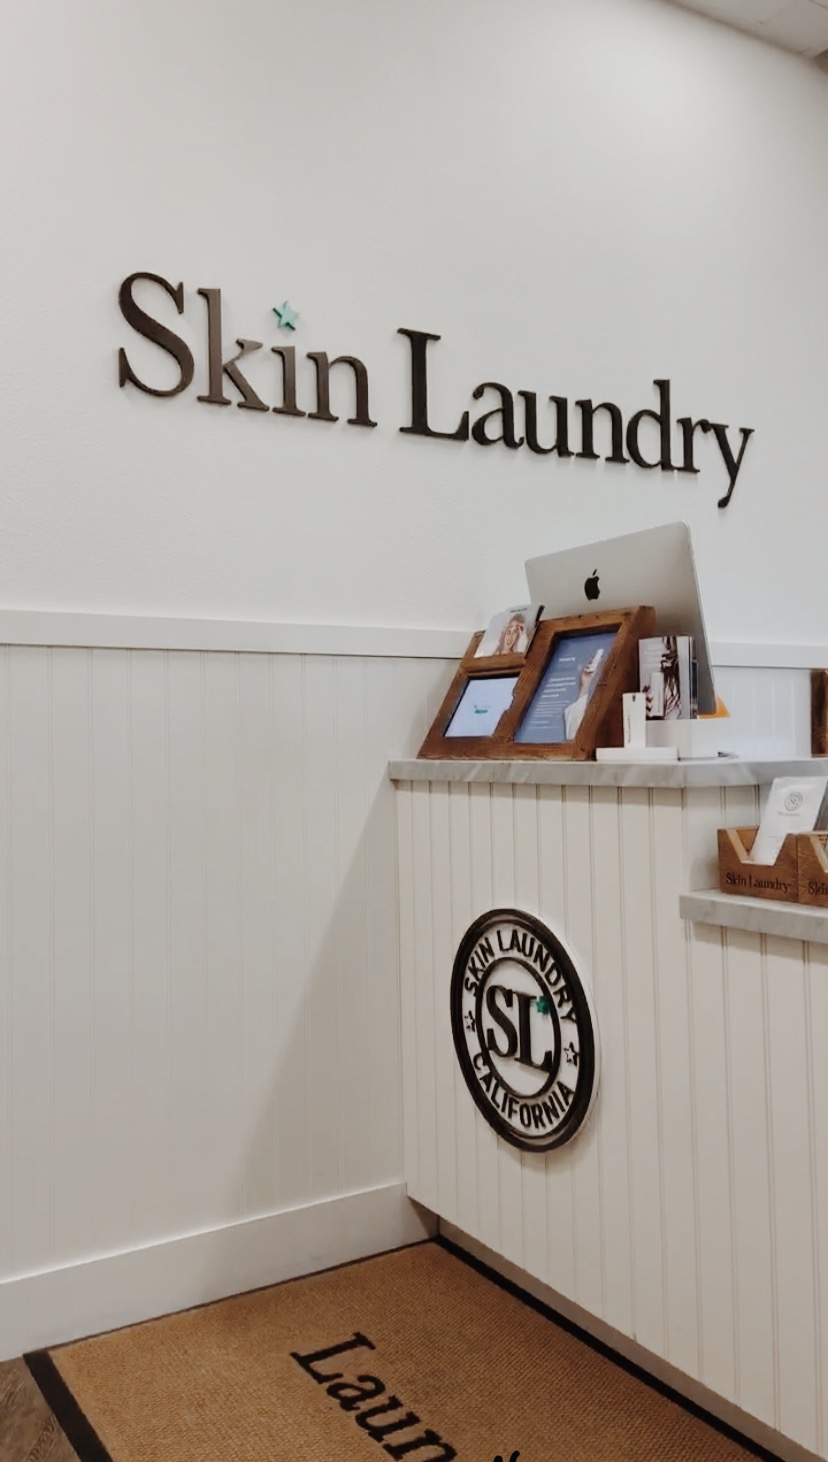 Skin Laundry- Irvine, CA